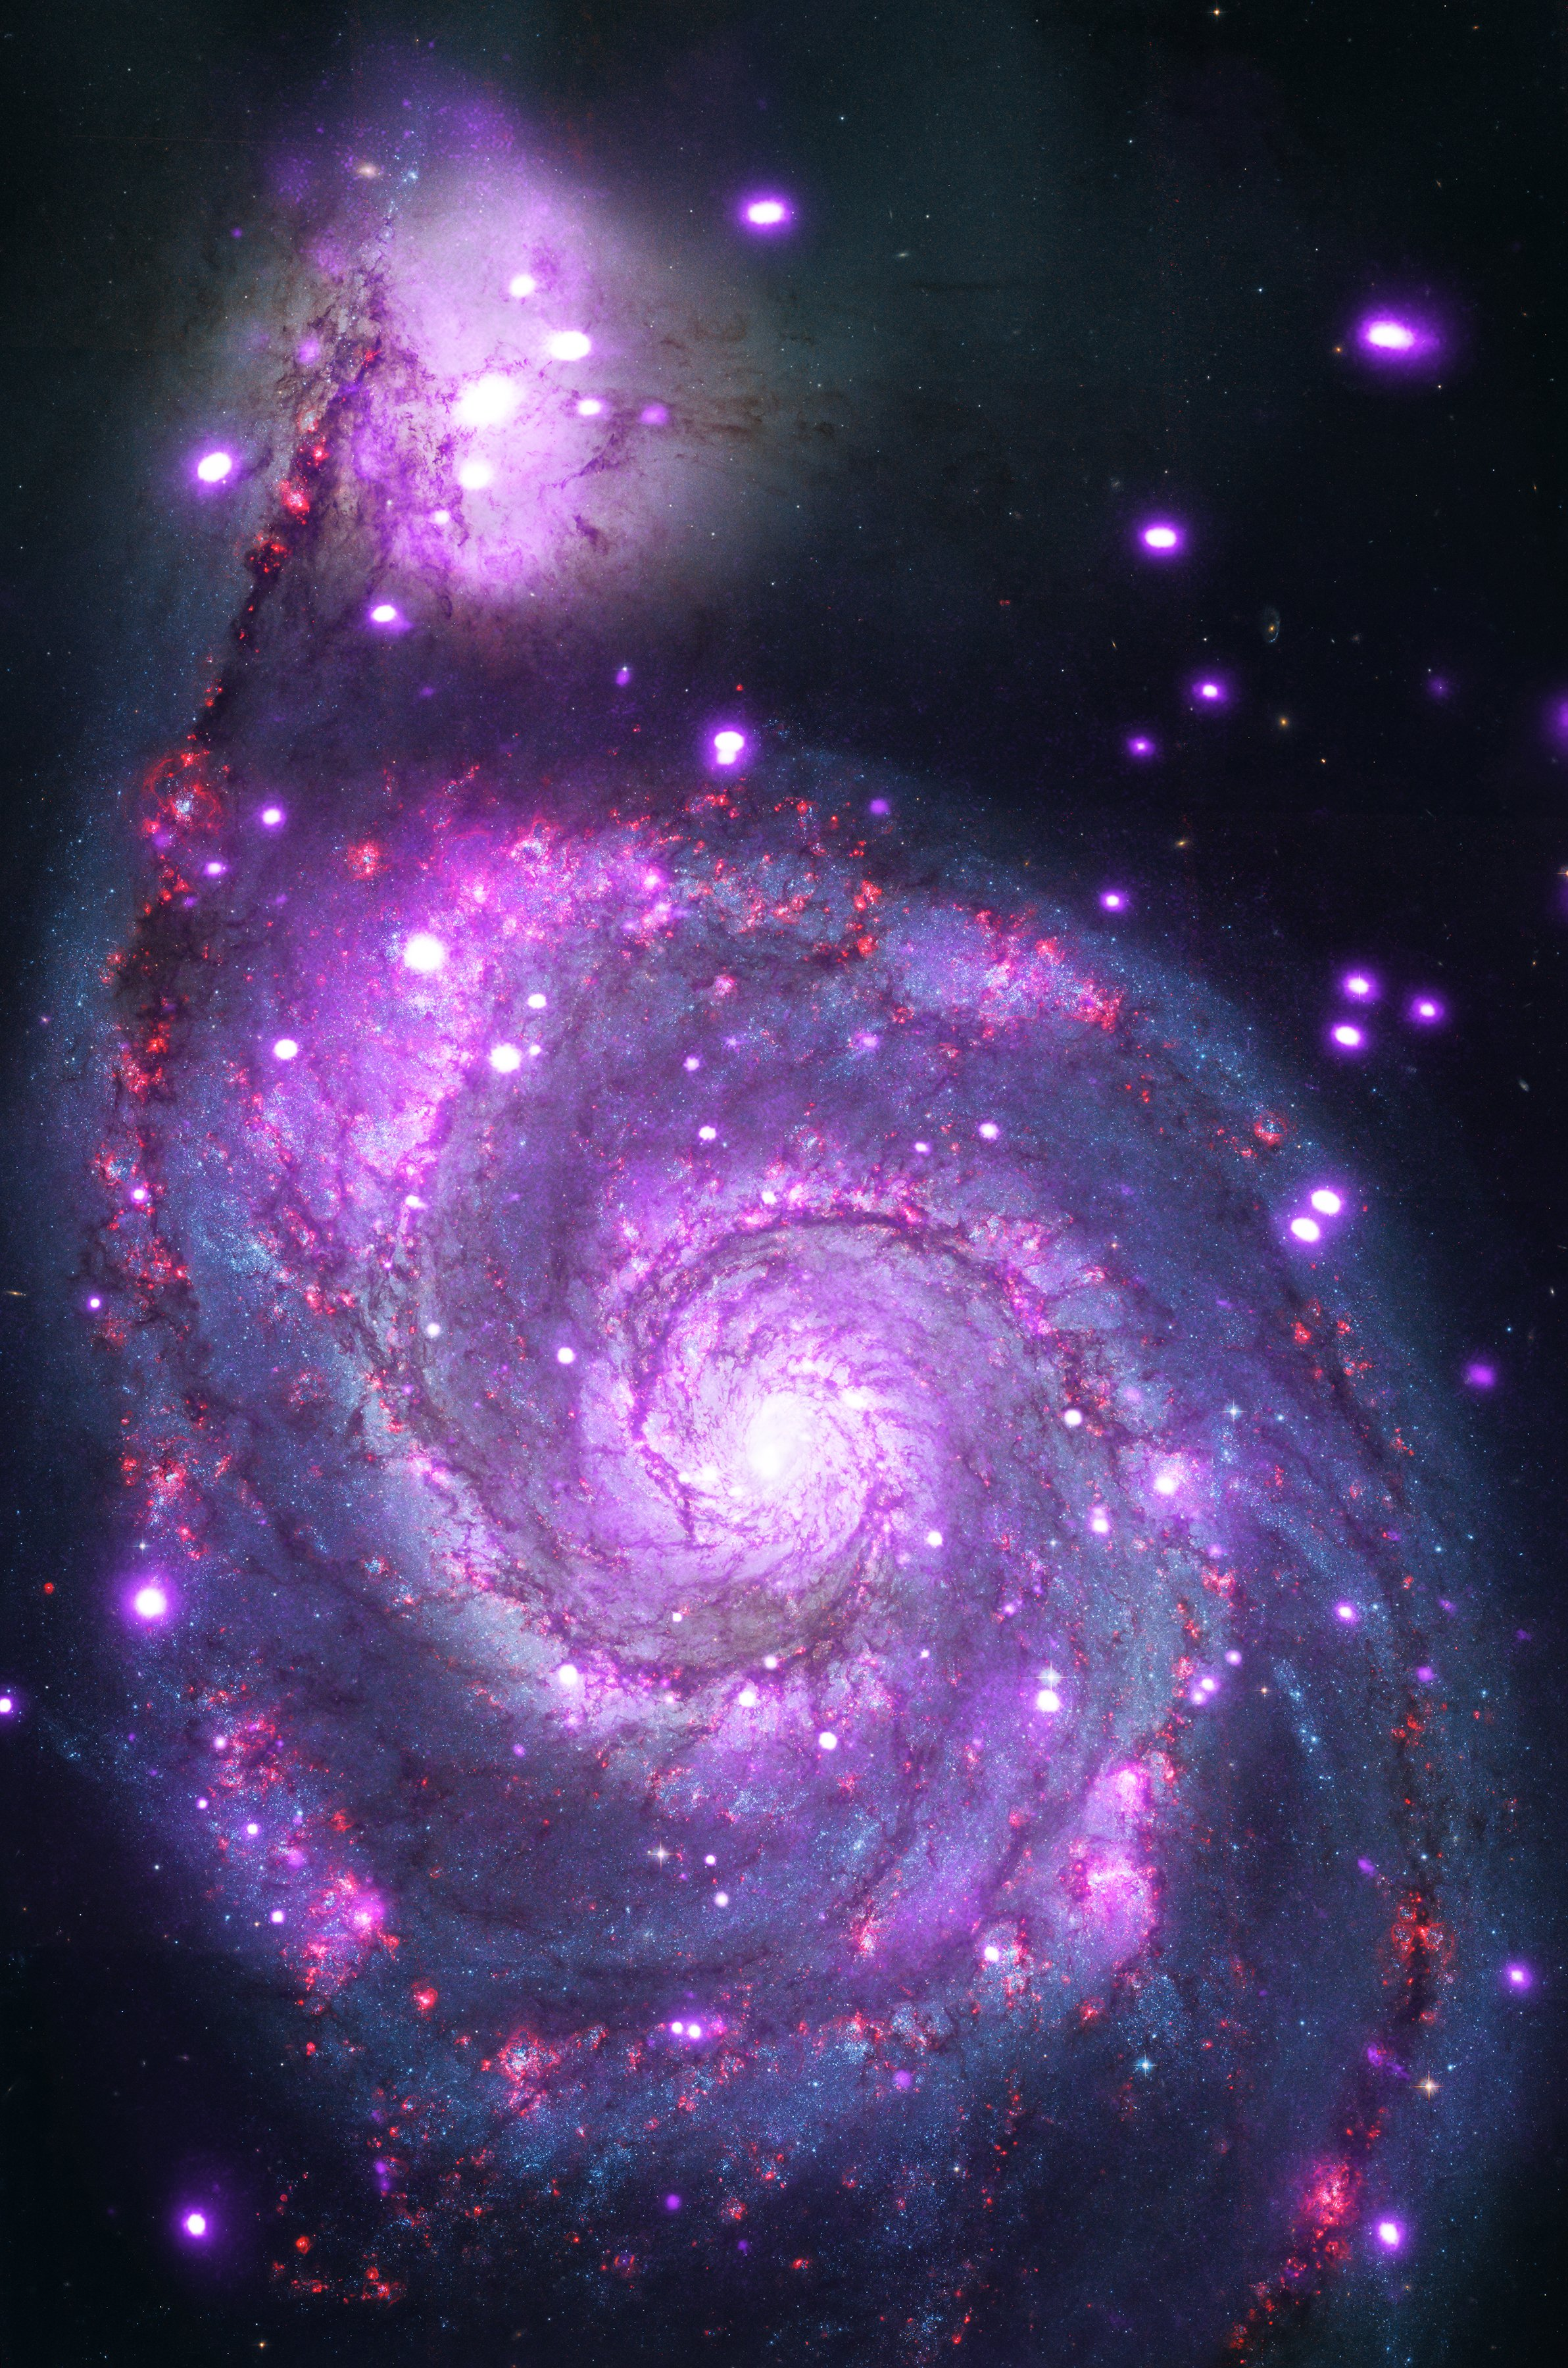 chandra captures galaxy sparkling